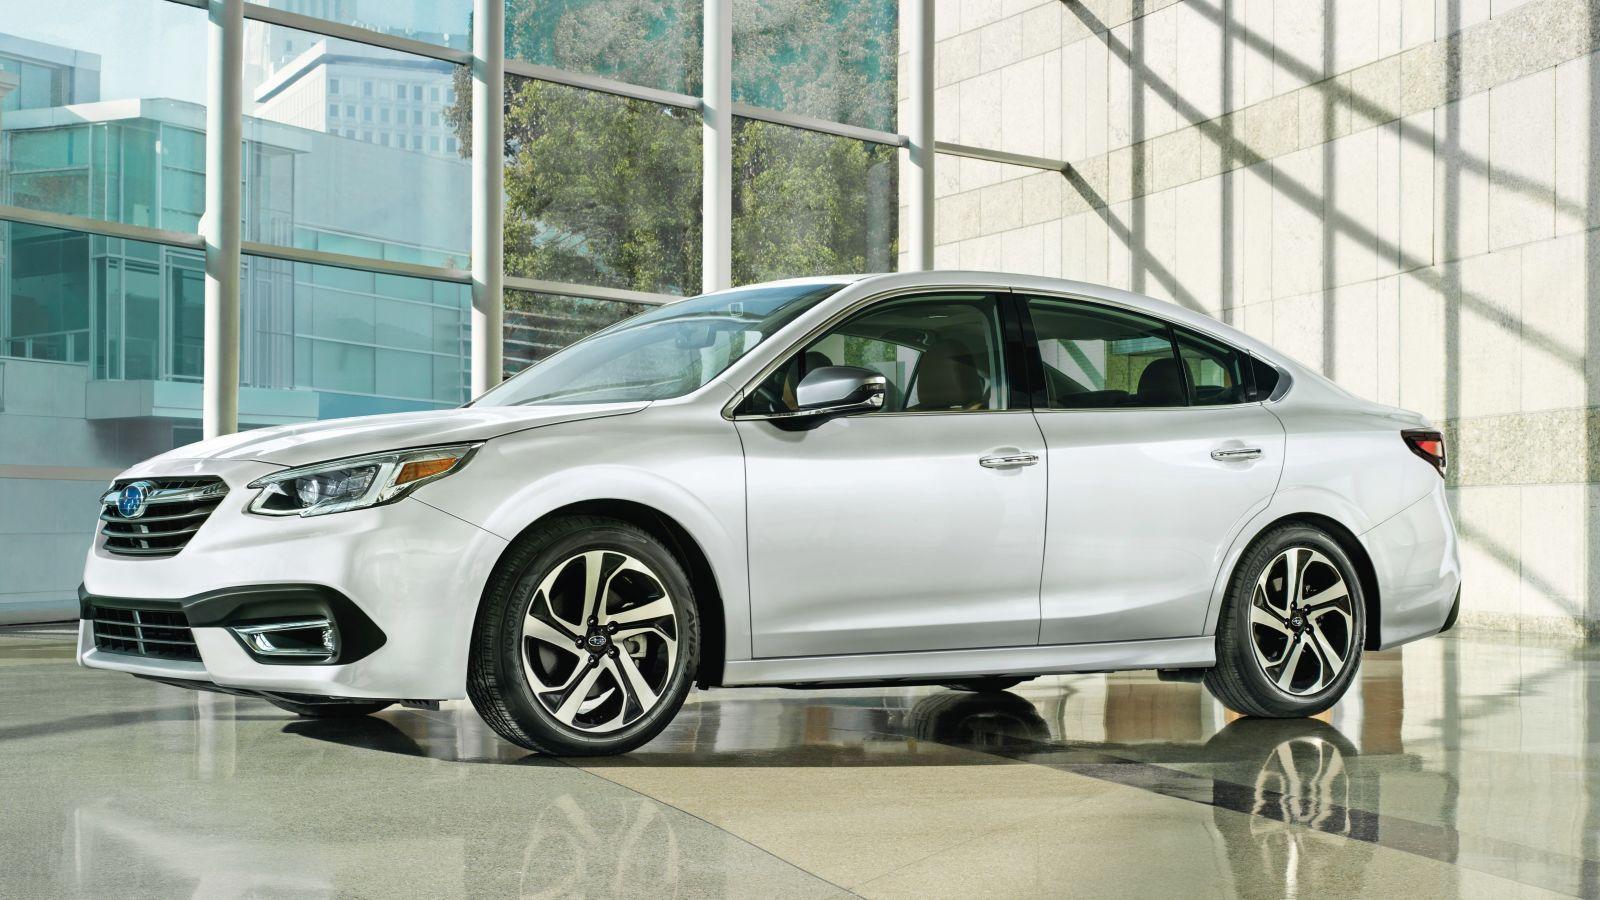 The 2020 Subaru Legacy Gets Turbo Power Back Jalopnik The 2020 Subaru Legacy Gets Turbo Power Backjalopnik I Can Remembe With Images Subaru Legacy Subaru Outback Subaru